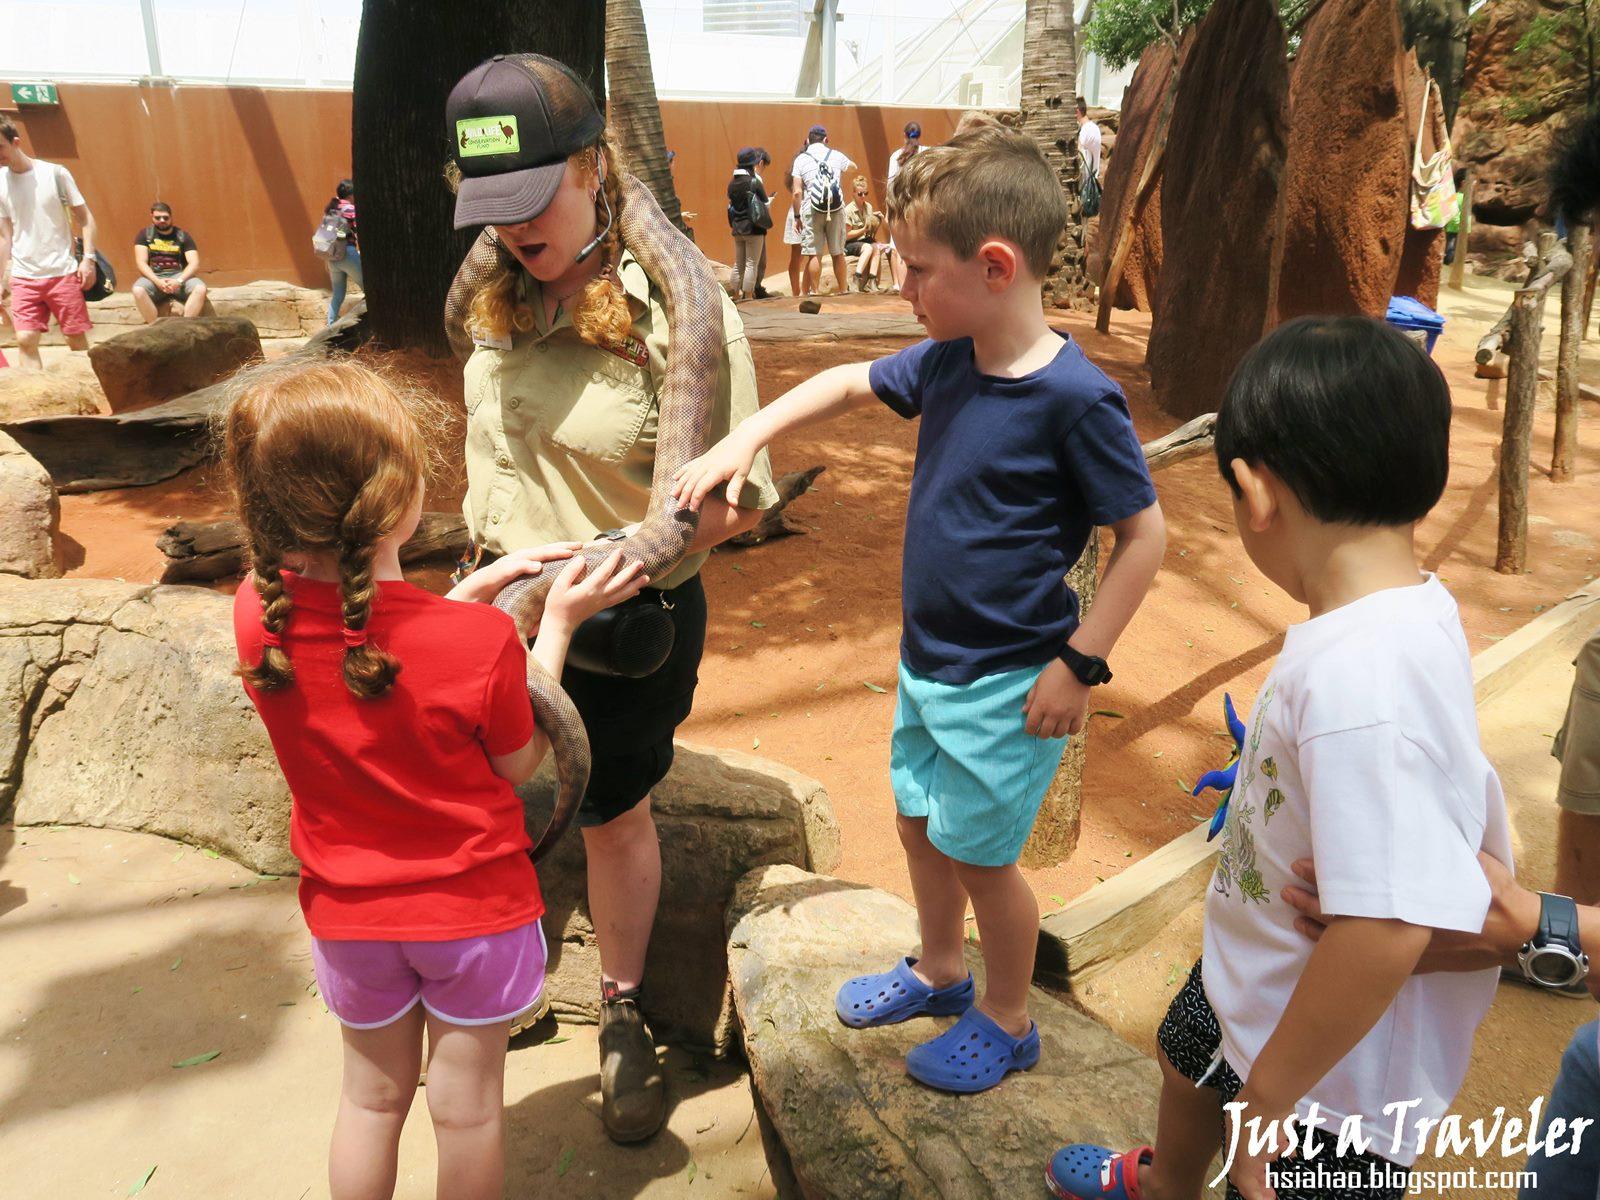 雪梨-景點-推薦-達令港-自由行-行程-旅遊-澳洲-雪梨野生動物園-WILD LIFE Sydney Zoo-Darling-Harbour-Tourist-Attraction-Travel